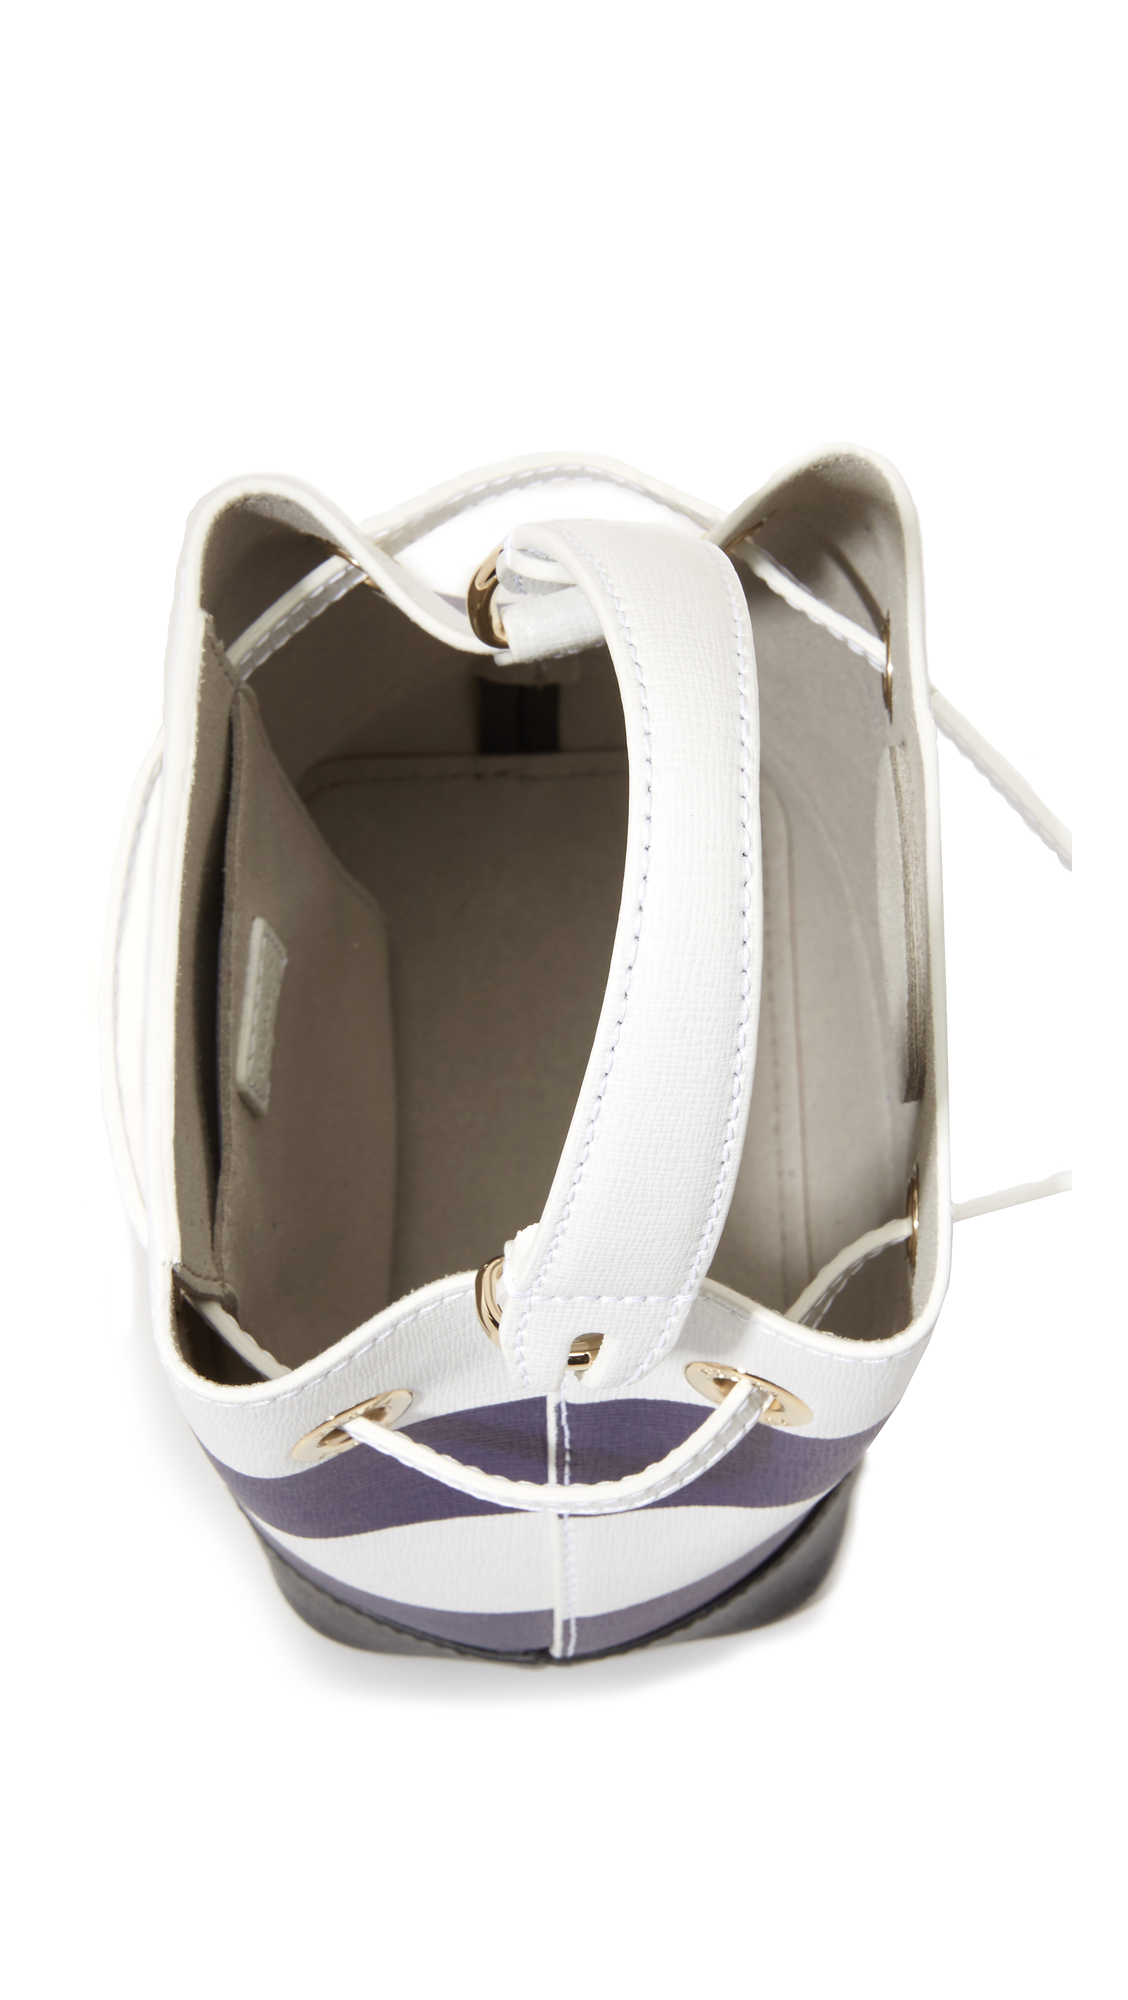 29c46633fb9 Furla Stripe Stacy Mini Bucket Bag   SHOPBOP